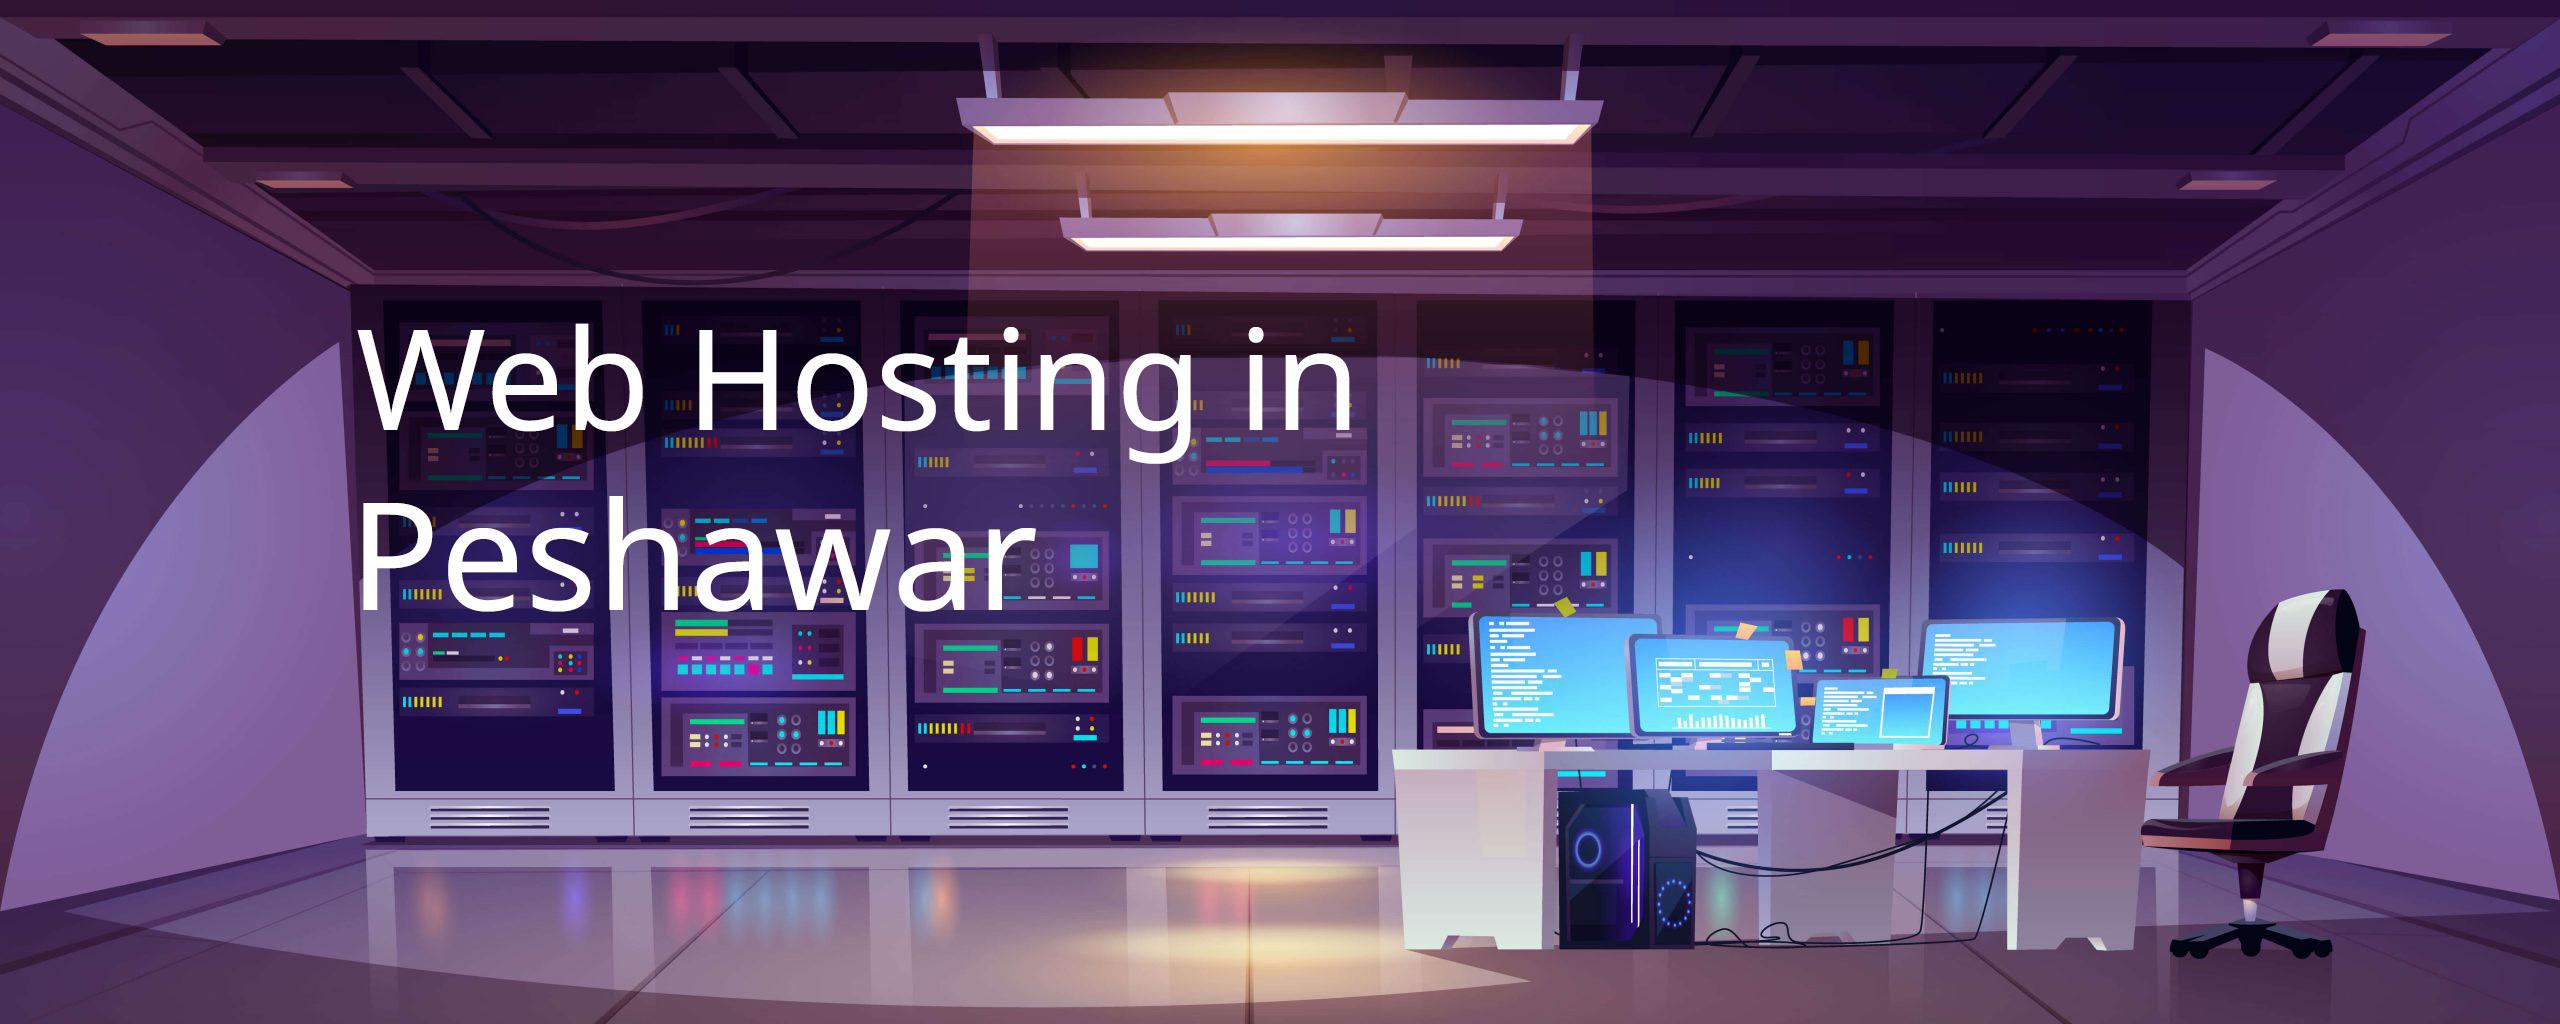 web-hosting-in-peshawar-madaar.net